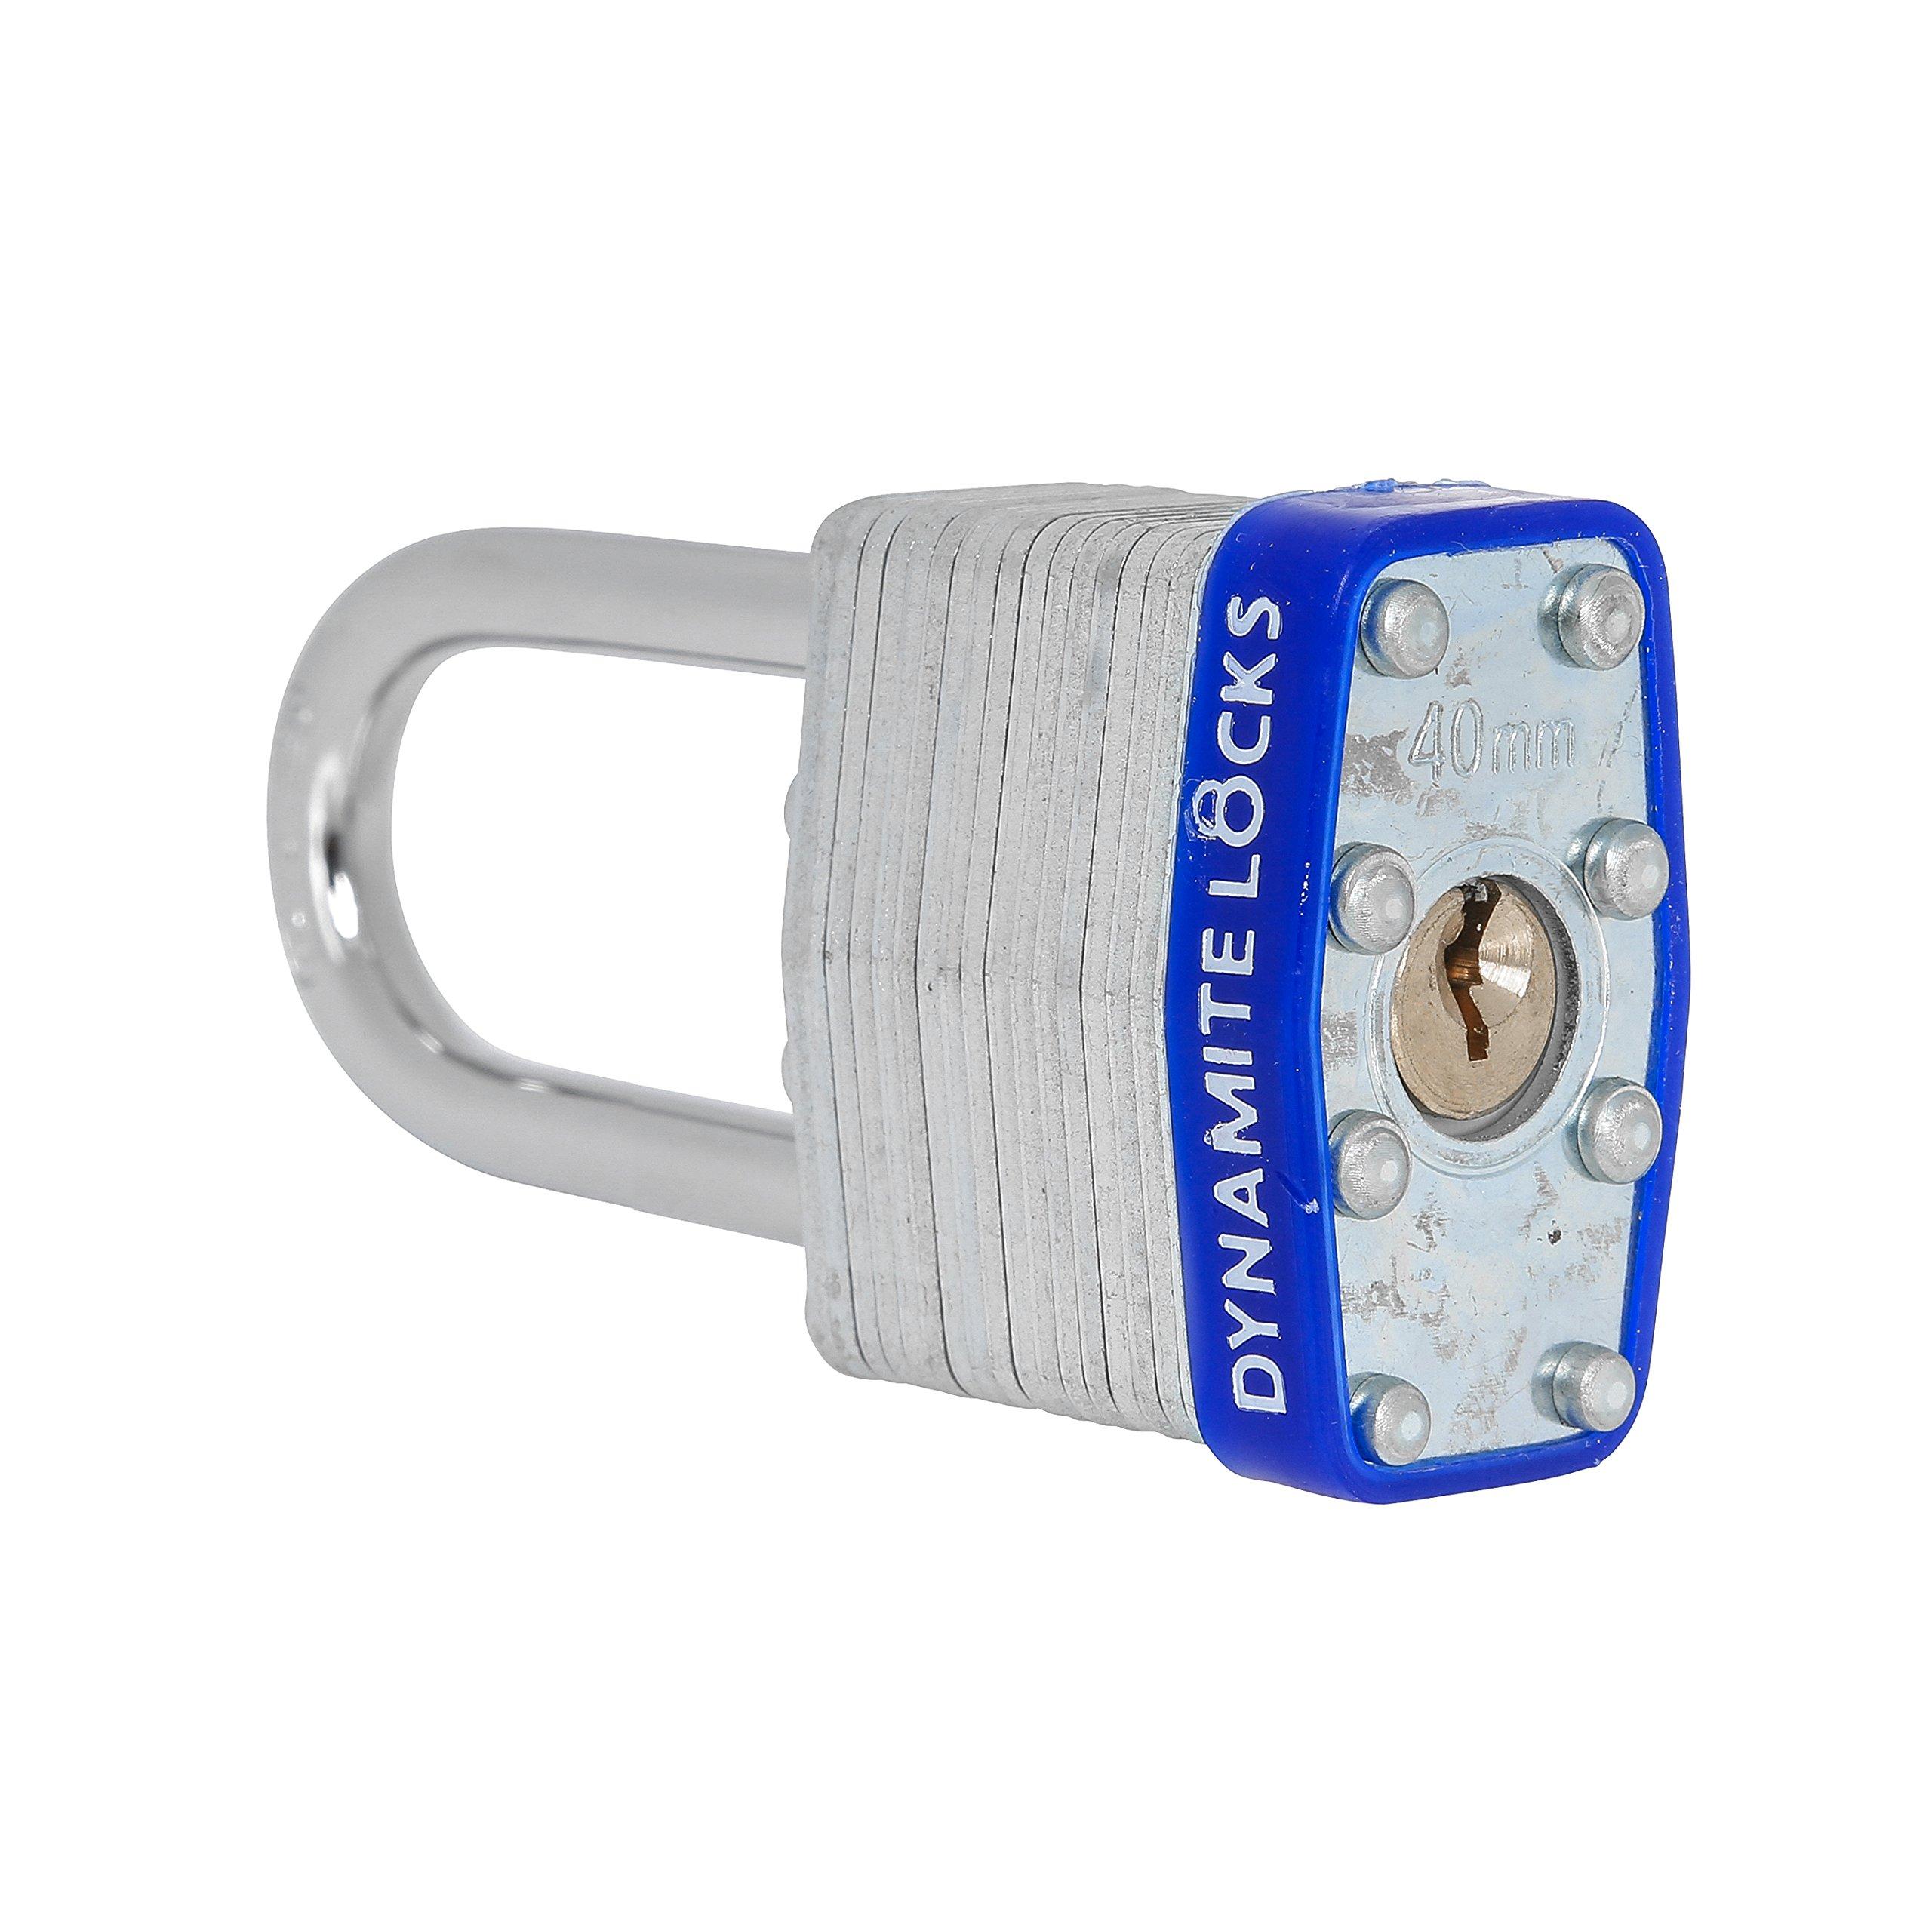 72 PC padlocks keyed alike 72-pack LAMINATED PADLOCK 40MM KEY ALIKE SHORT SHACKLE COMMERCIAL GRADE SECURITY PAD LOCKS PADLOCK KEYED THE SAME A LIKE by Dynamite Locks (Image #6)